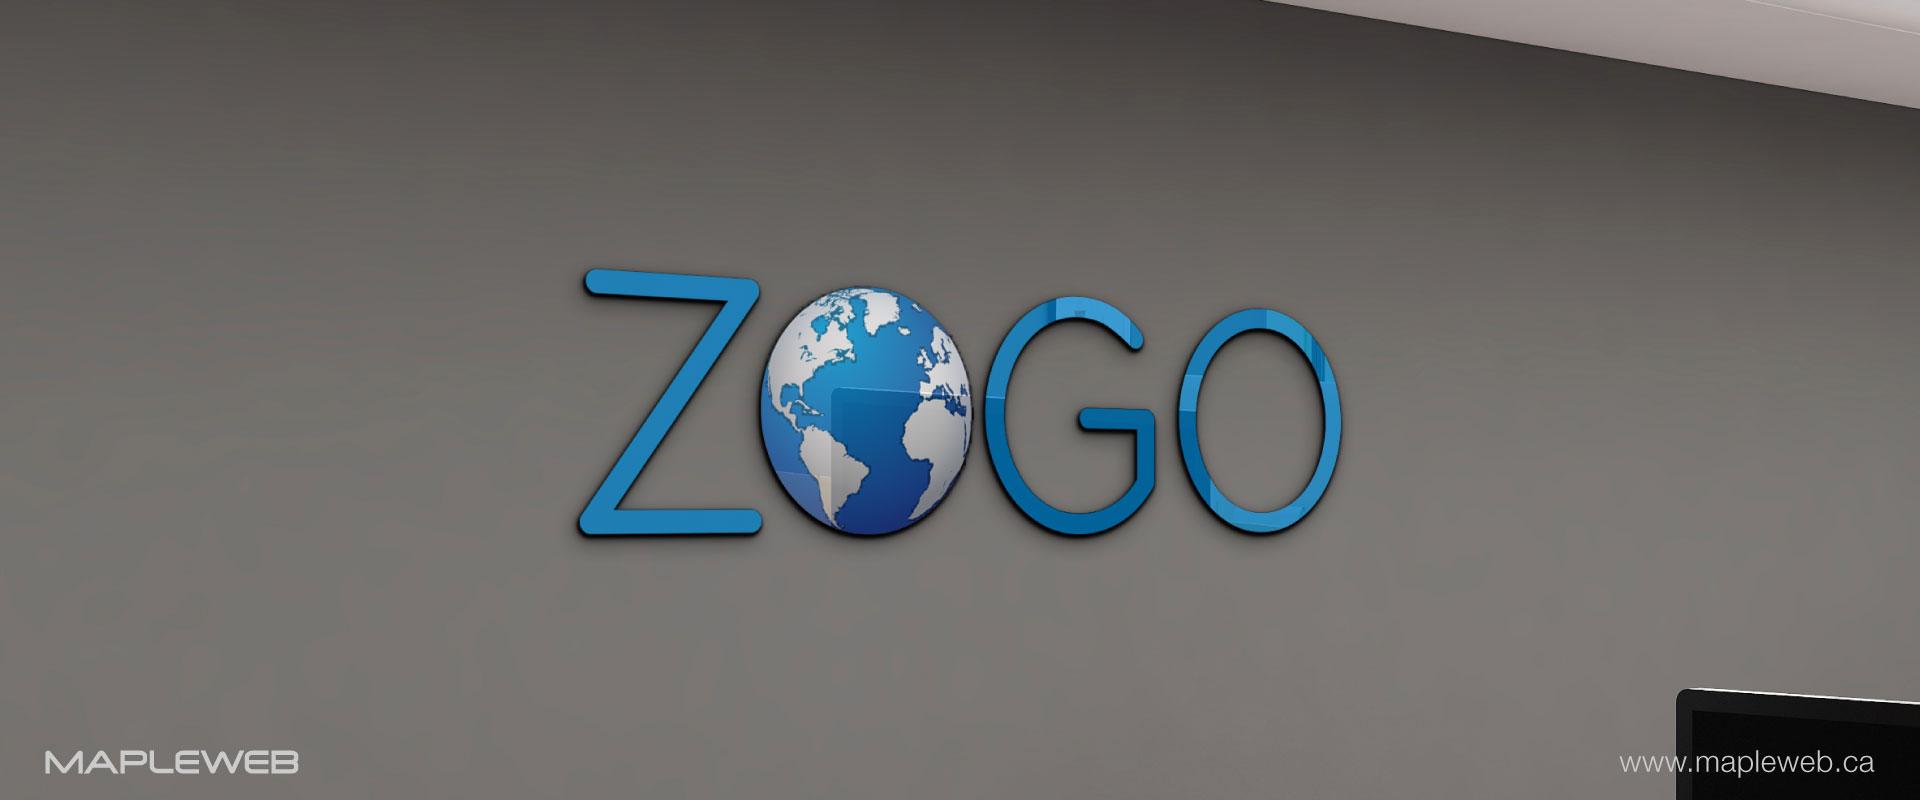 zogo-brand-logo-design-by-mapleweb-vancouver-canada-wall-mock